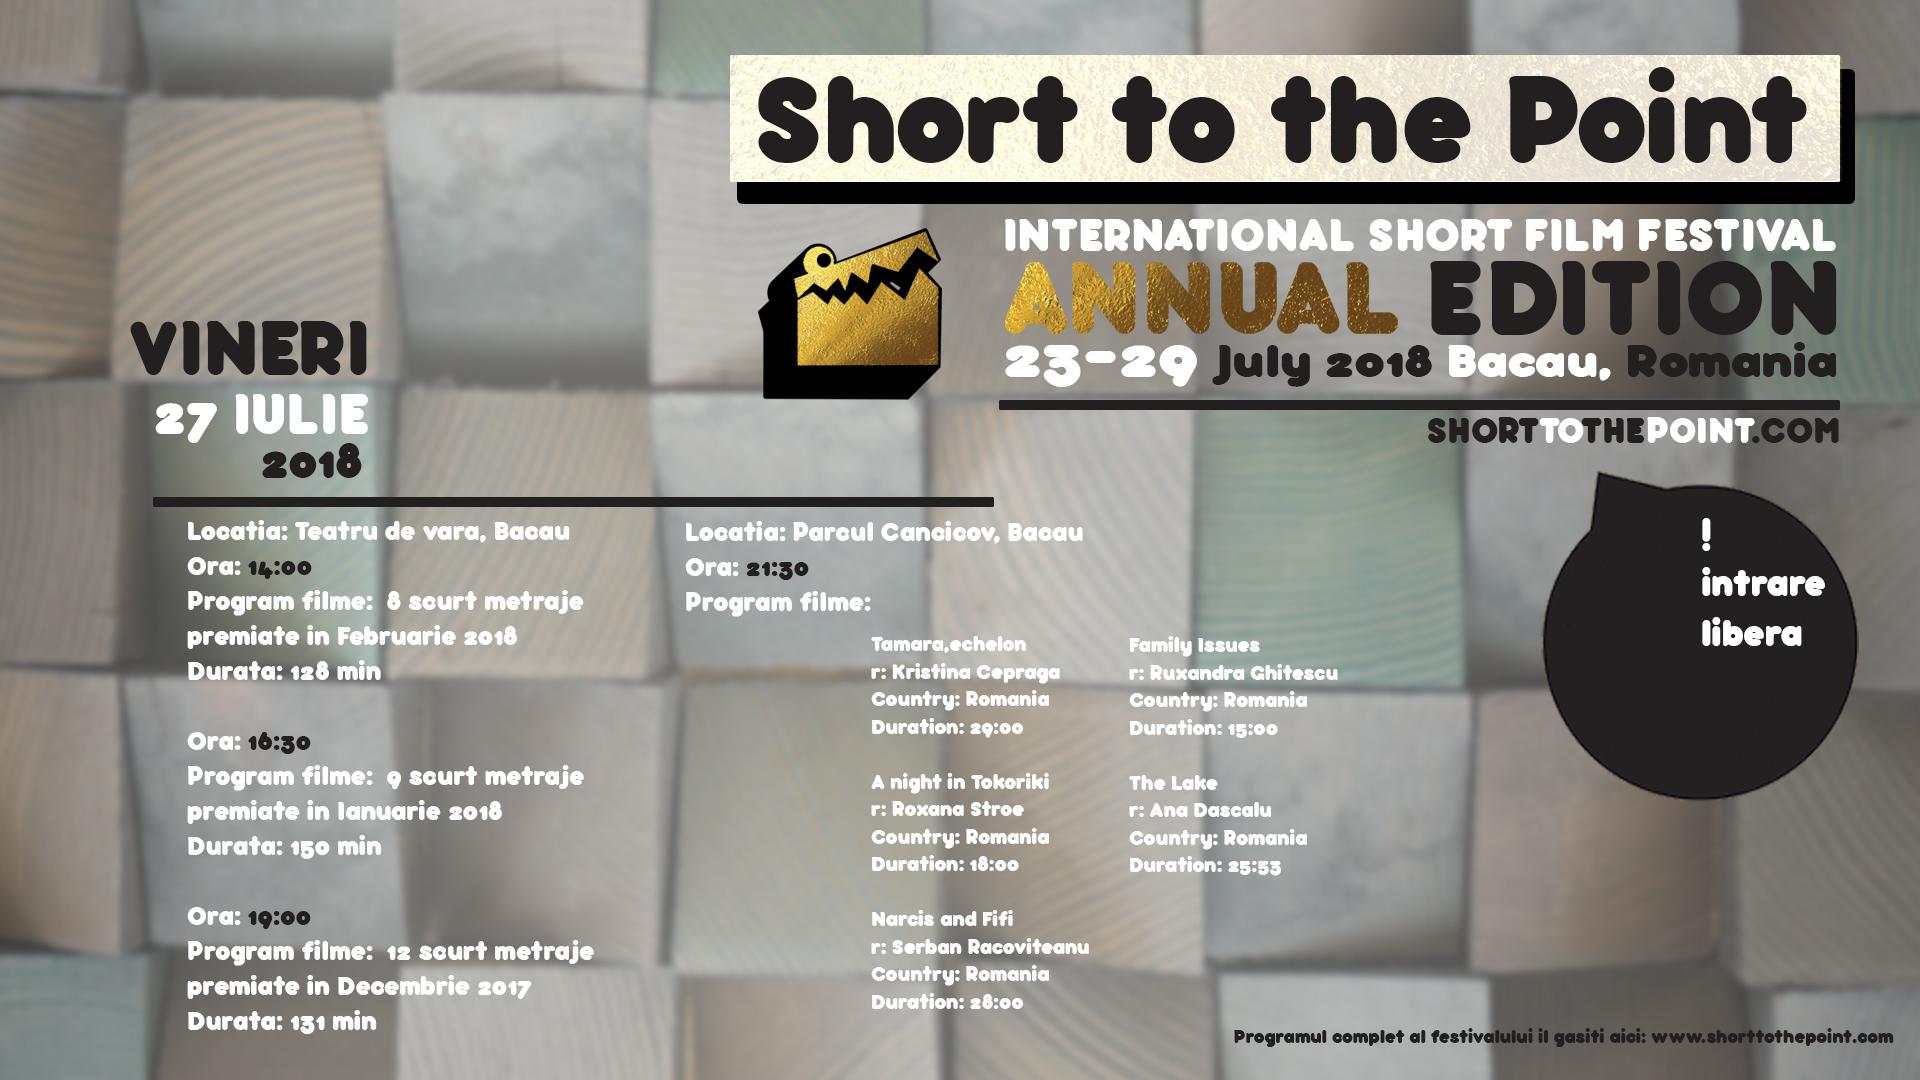 Vineri 27 Iulie 2018 – Teatru de vara si Parcul Cancicov [STTP Annual Edition]